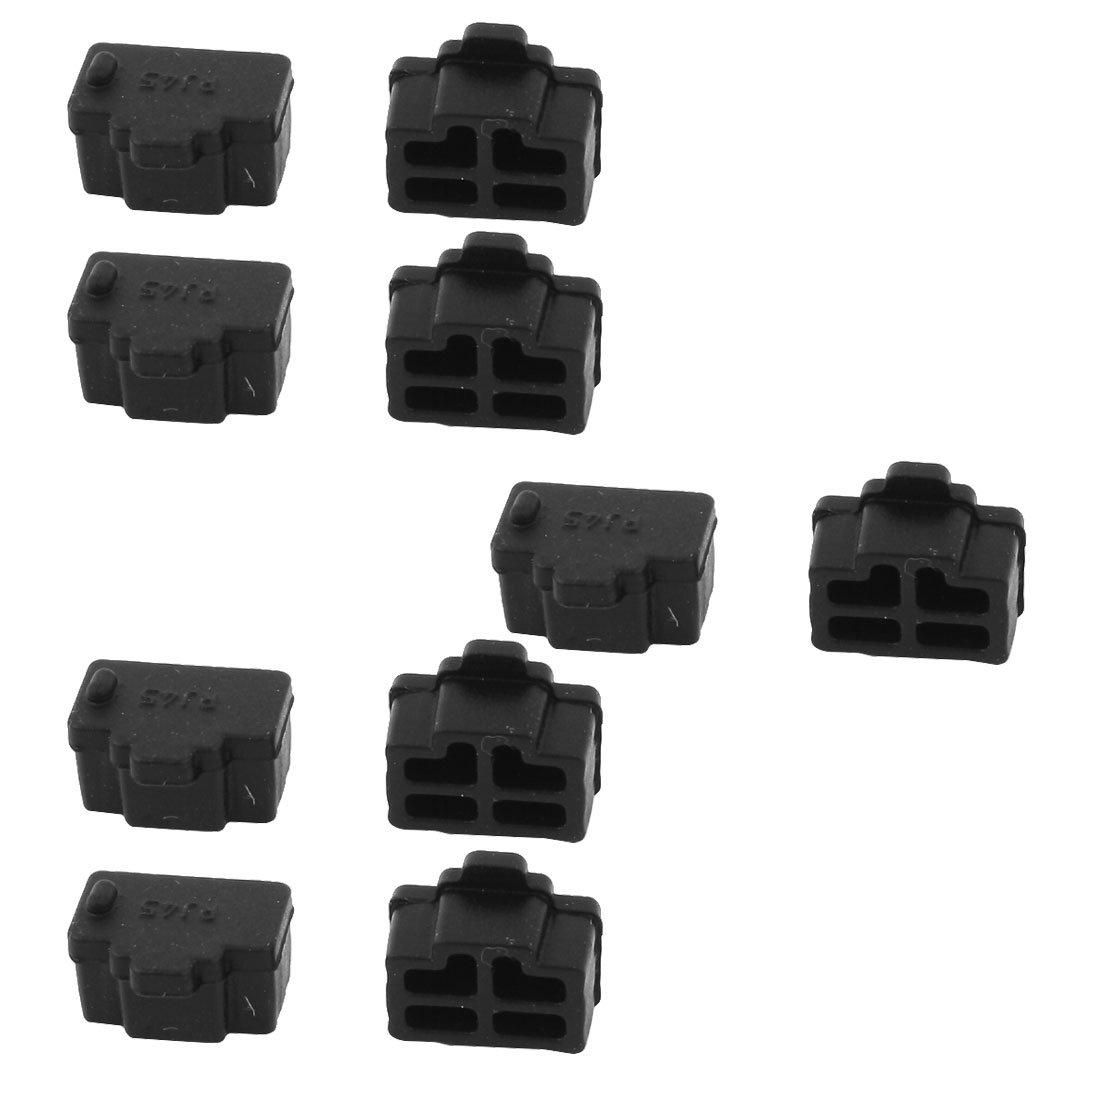 uxcell Ethernet Hub Port RJ45 Cover Cap Protector Connector 10Pcs Black